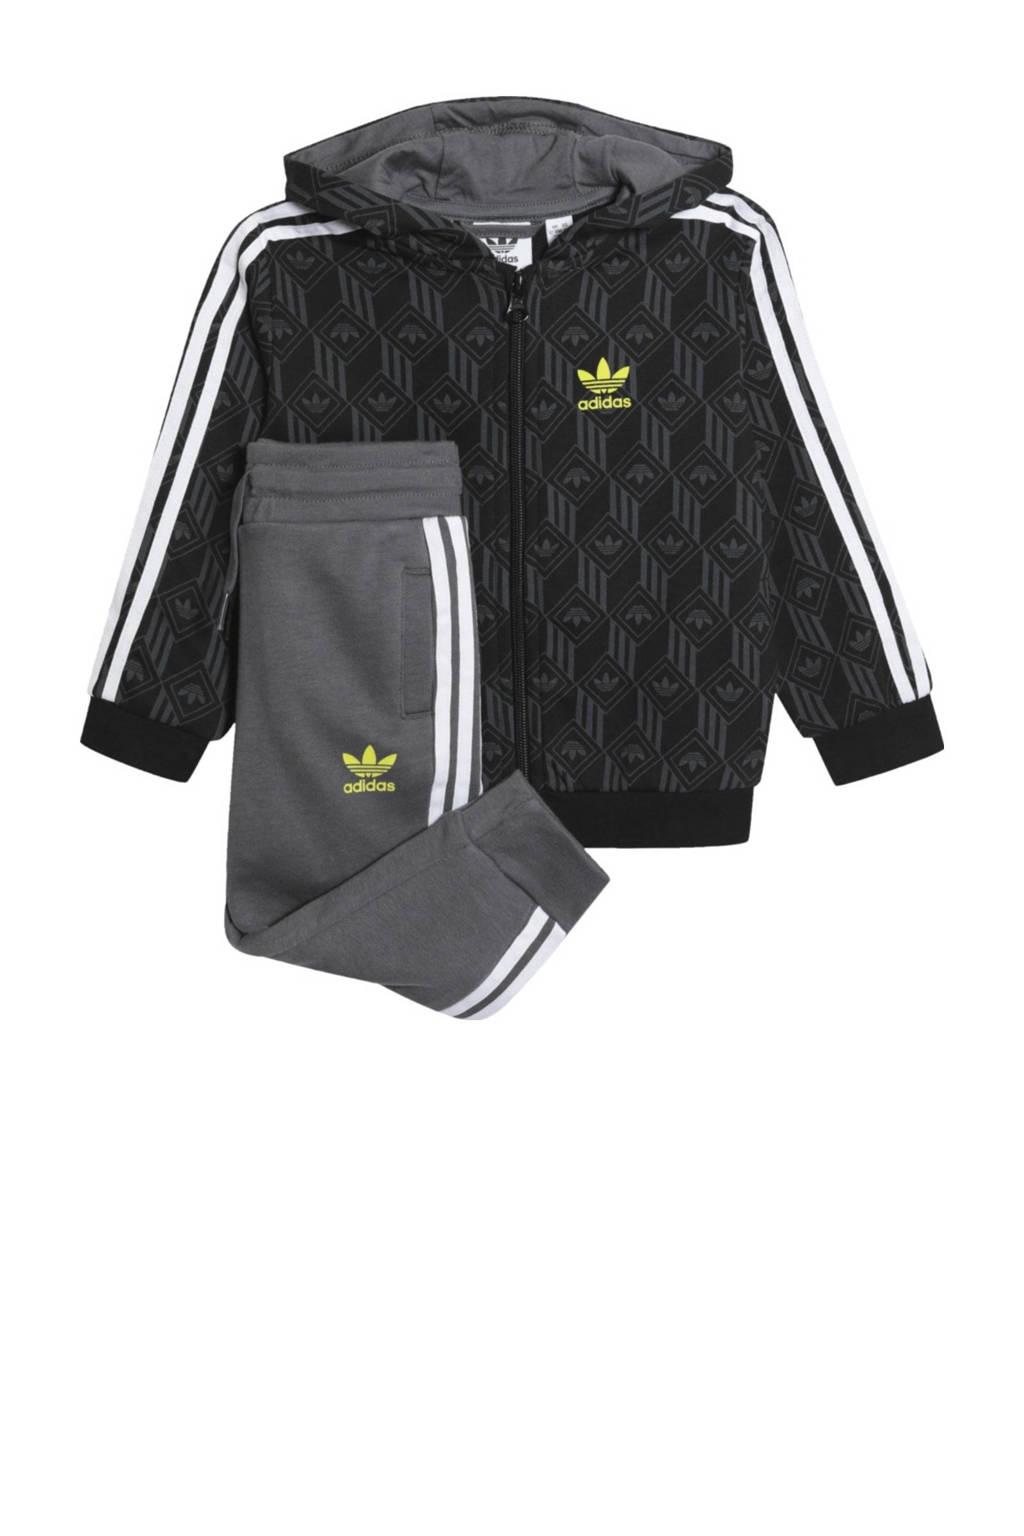 adidas Originals   trainingspak zwart/grijs, Zwart/grijs